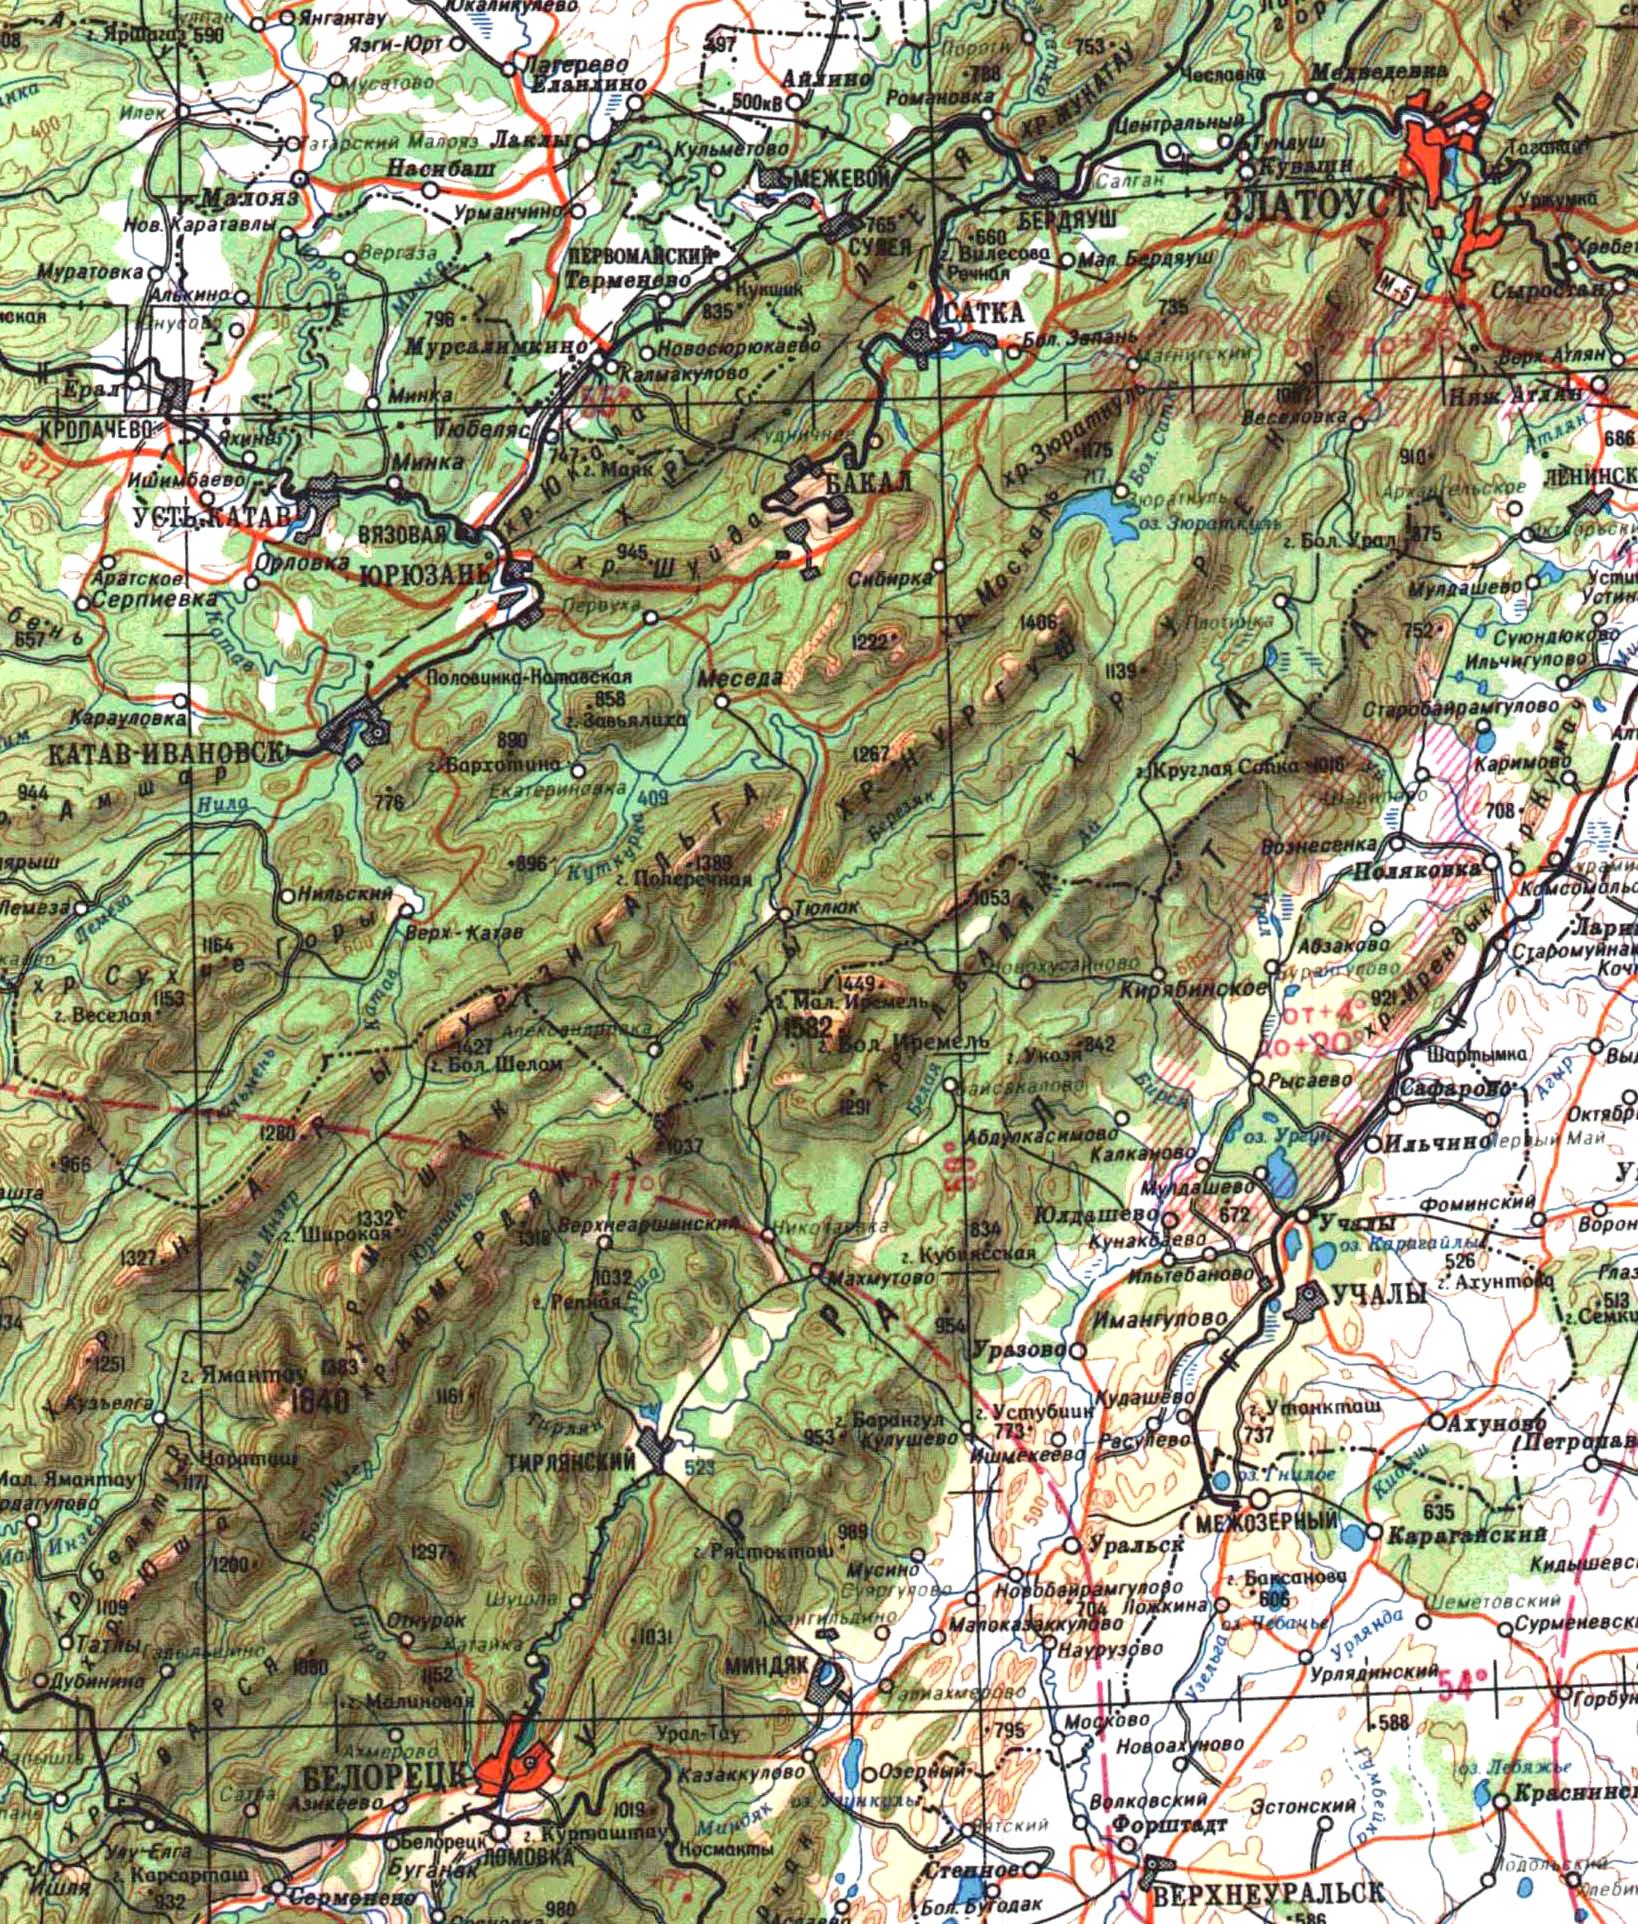 http://www.bashturist.ru/maps/sity/data/media/70/bashturist.ru_N40_center_10km.jpg